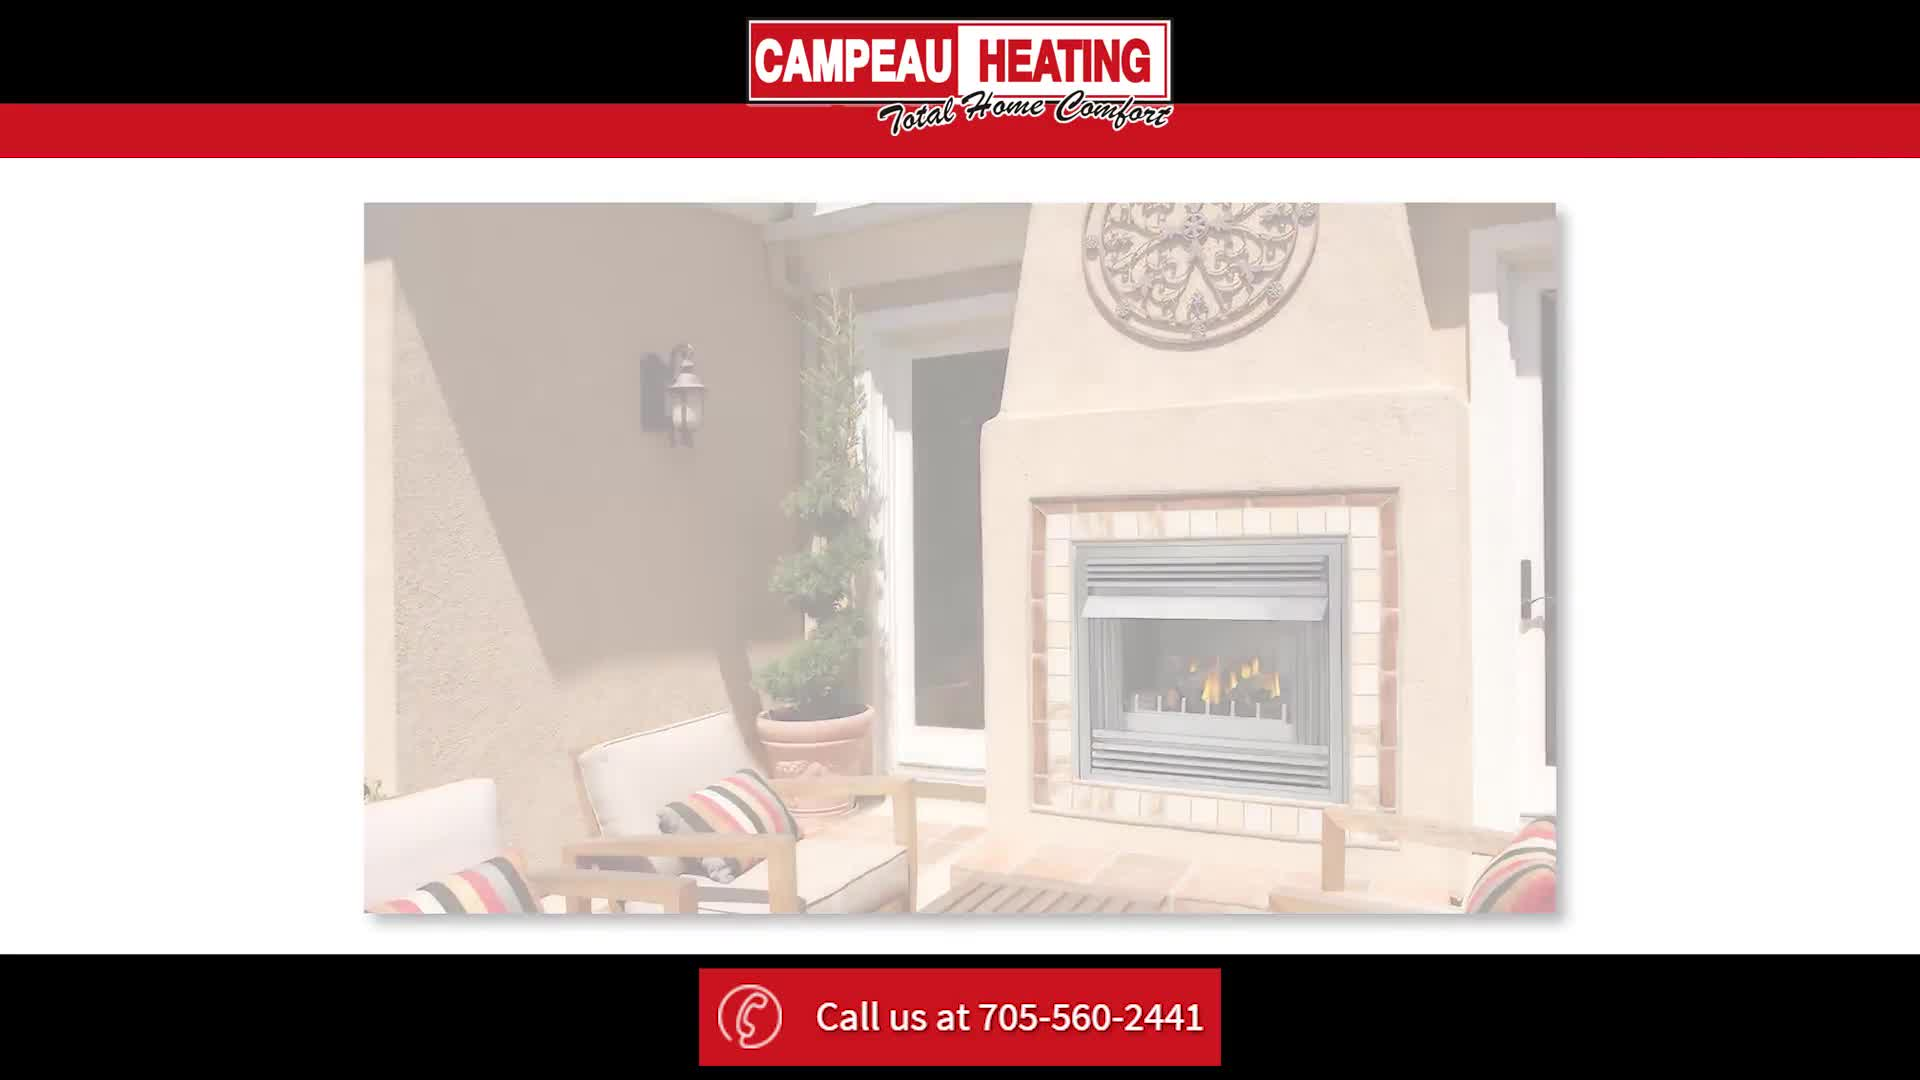 Campeau Heating - Heating Contractors - 705-560-2441